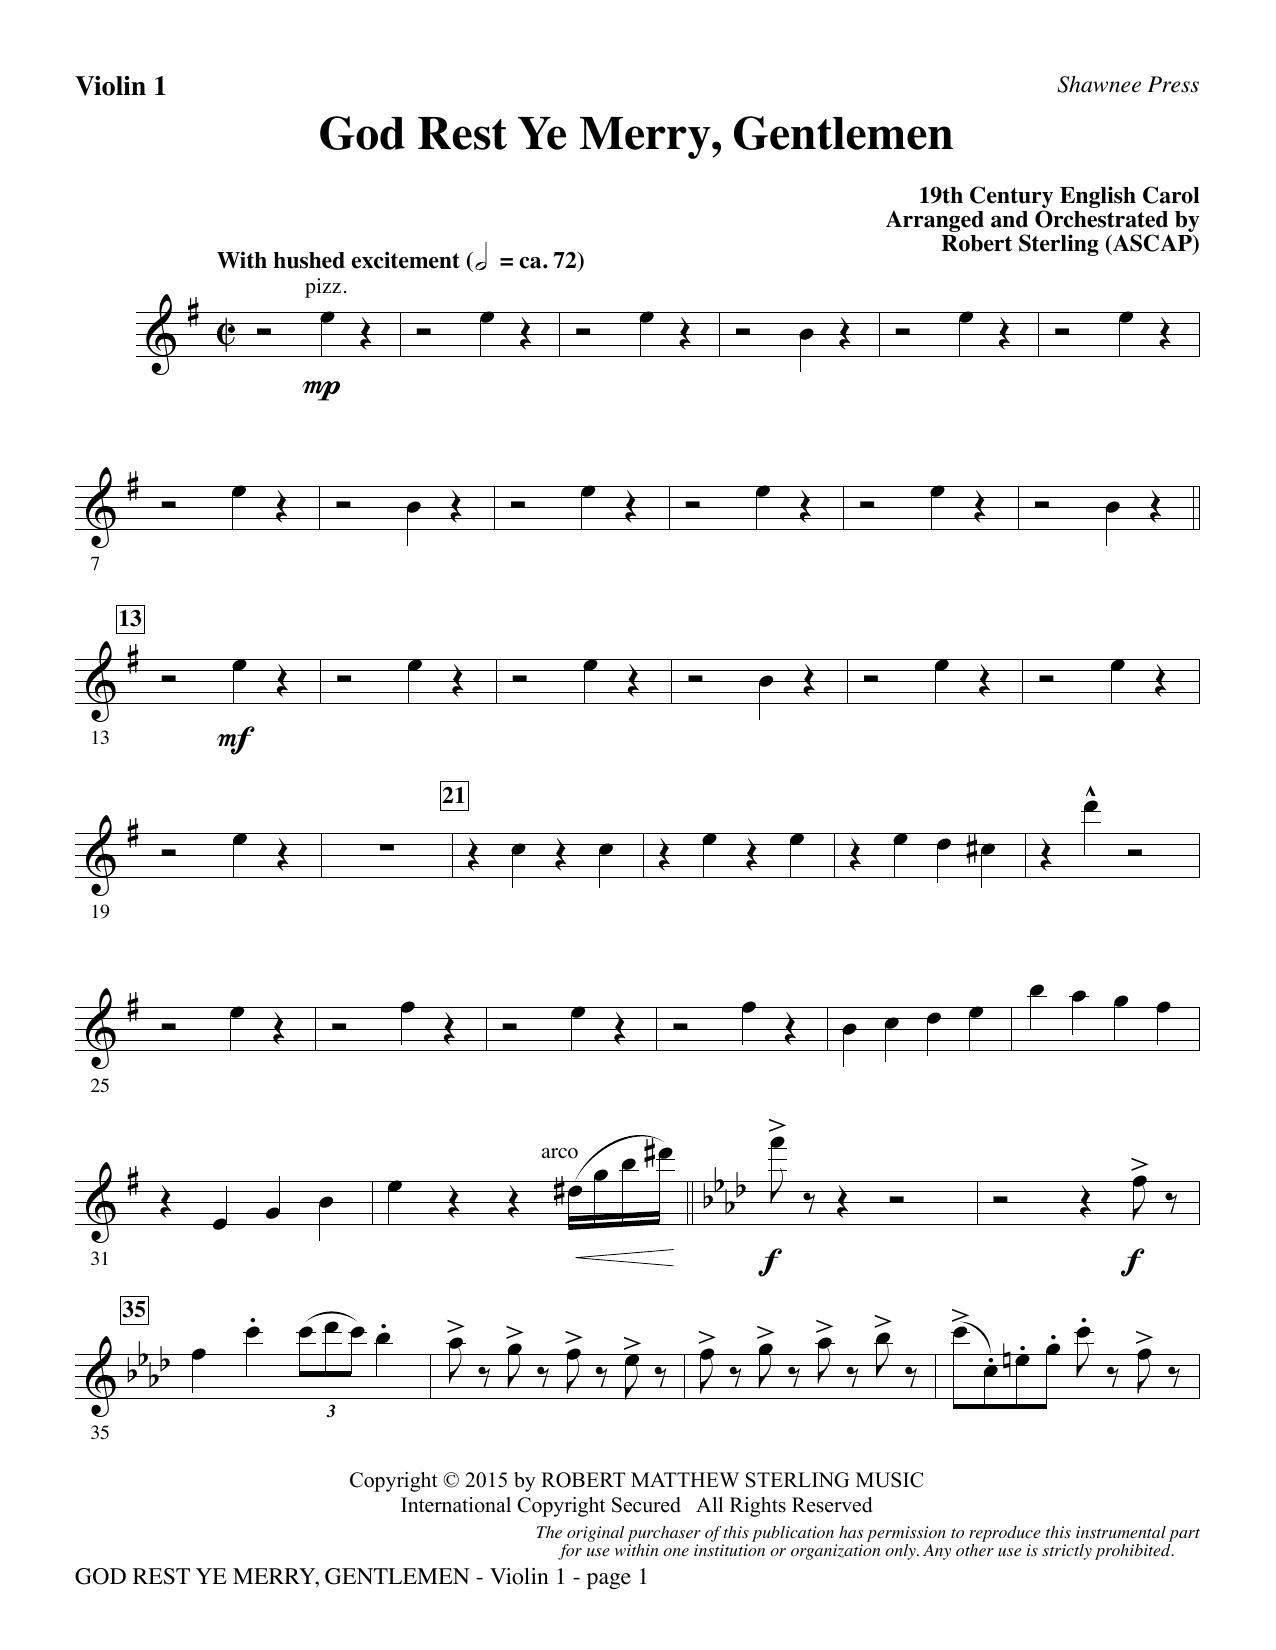 God Rest Ye Merry, Gentlemen - Violin 1 sheet music